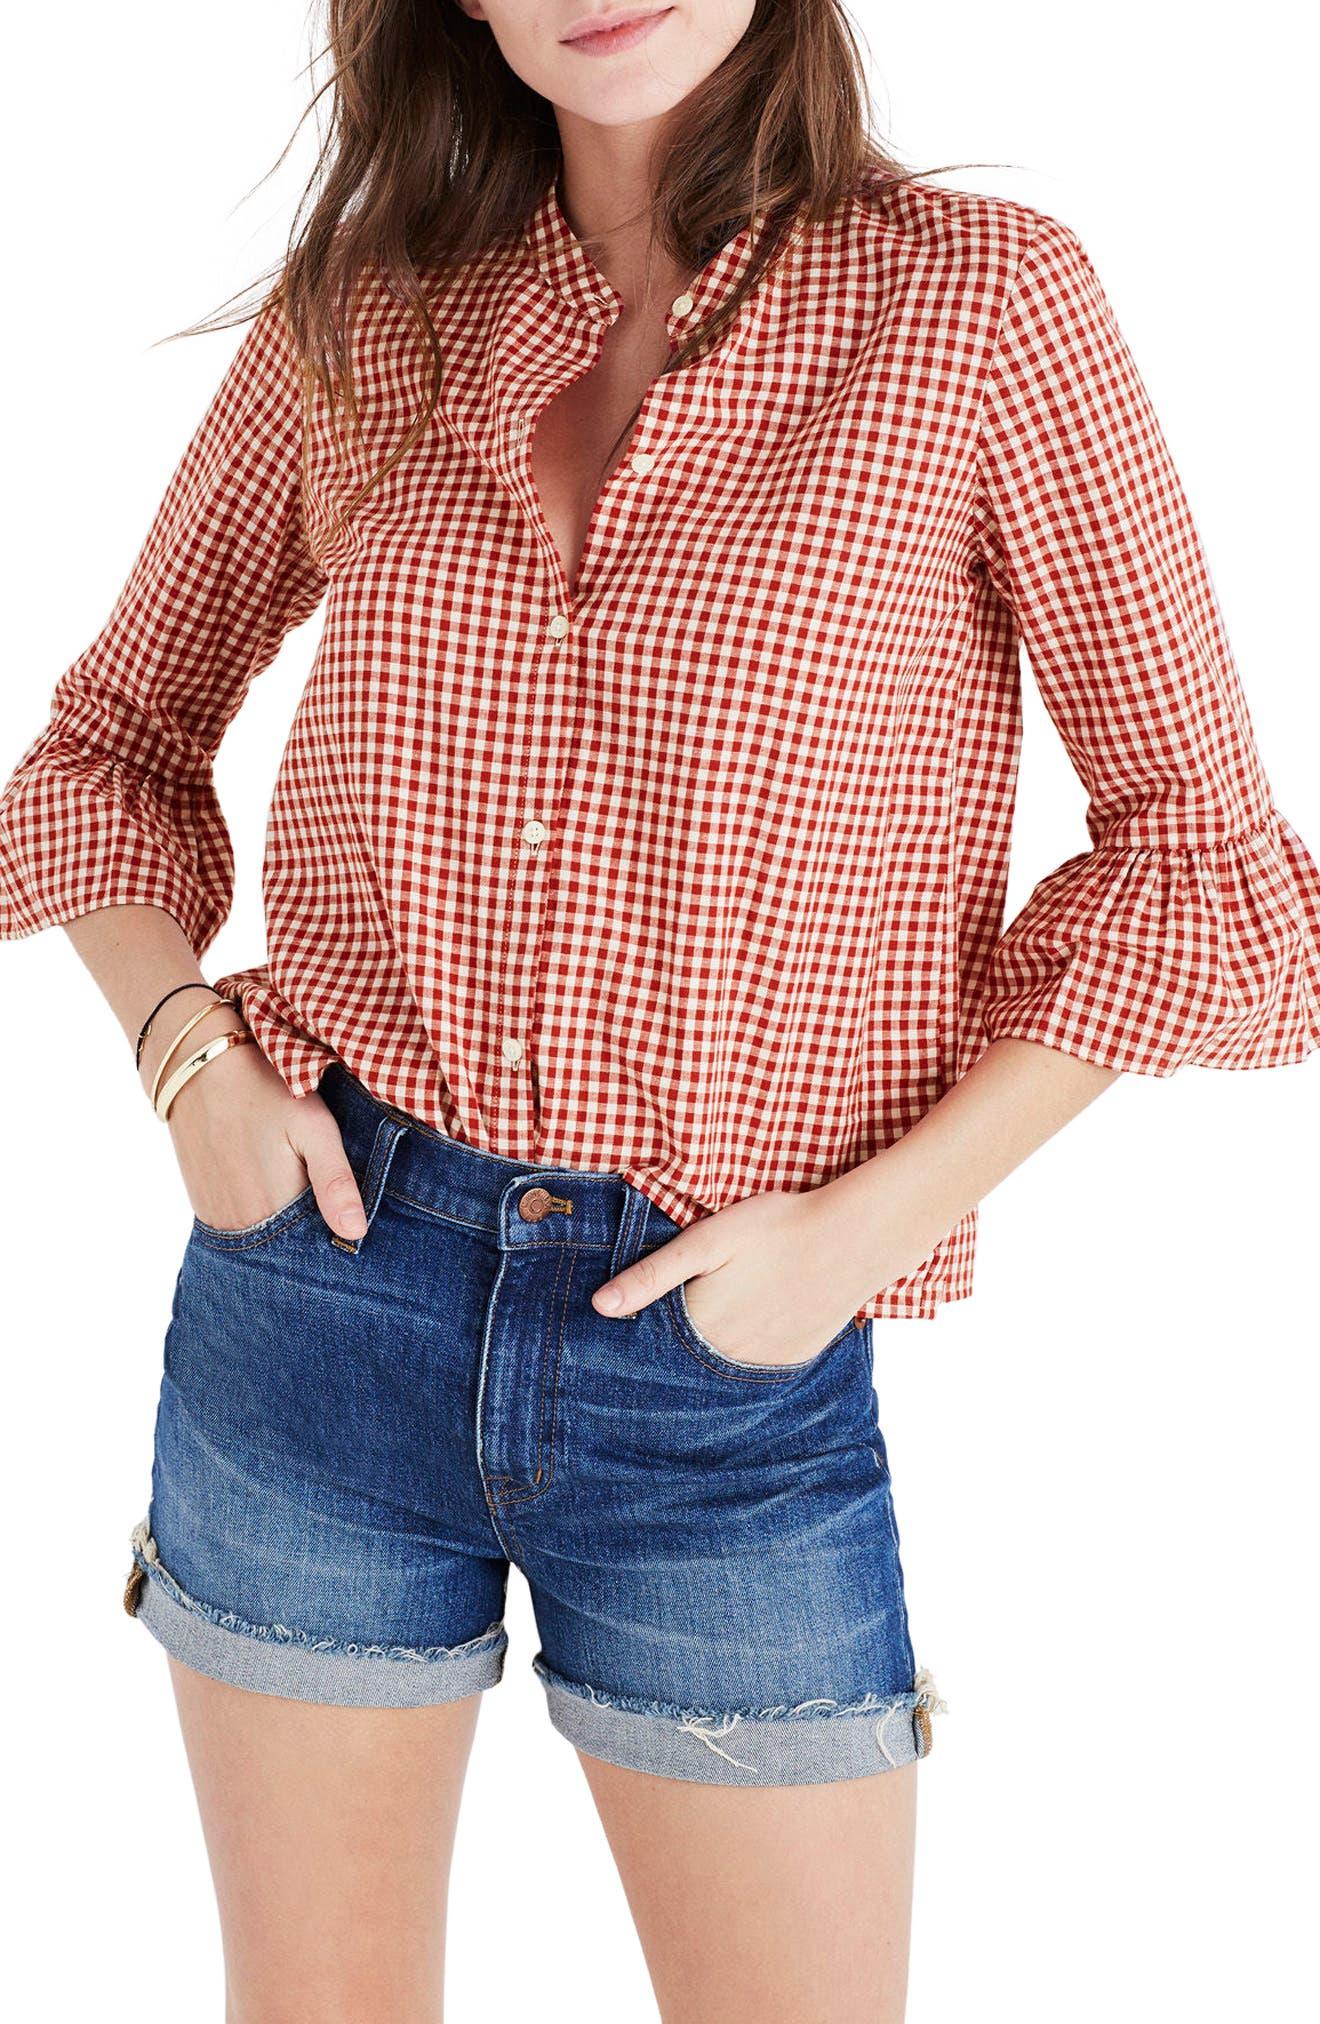 Alternate Image 1 Selected - Madewell Gingham Bell Sleeve Shirt